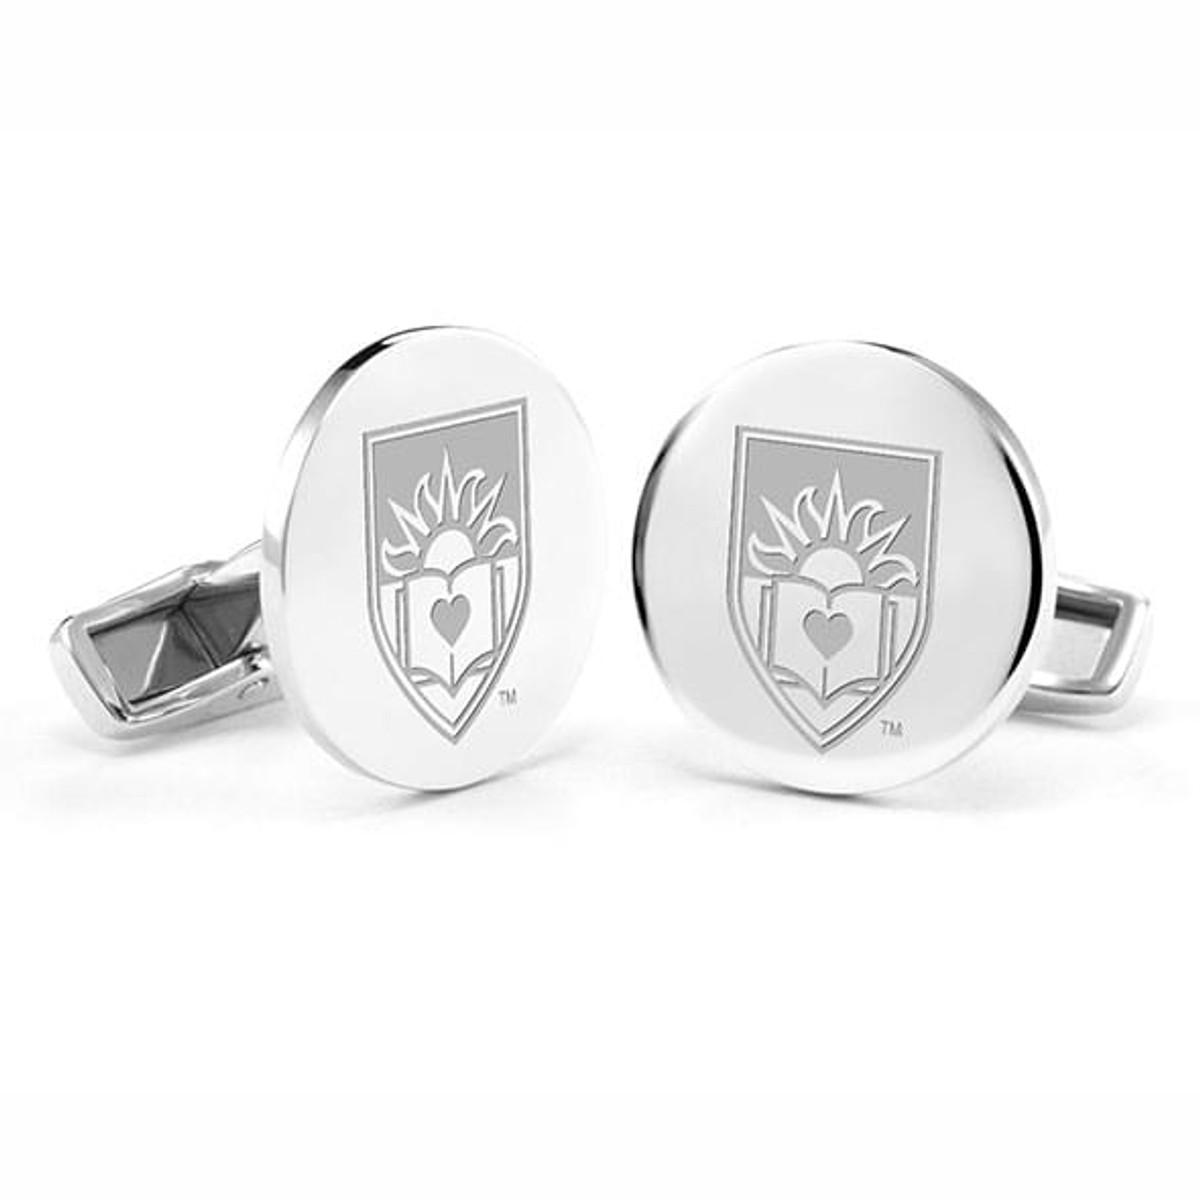 Jewel Tie 925 Sterling Silver Penn State University Cuff Link